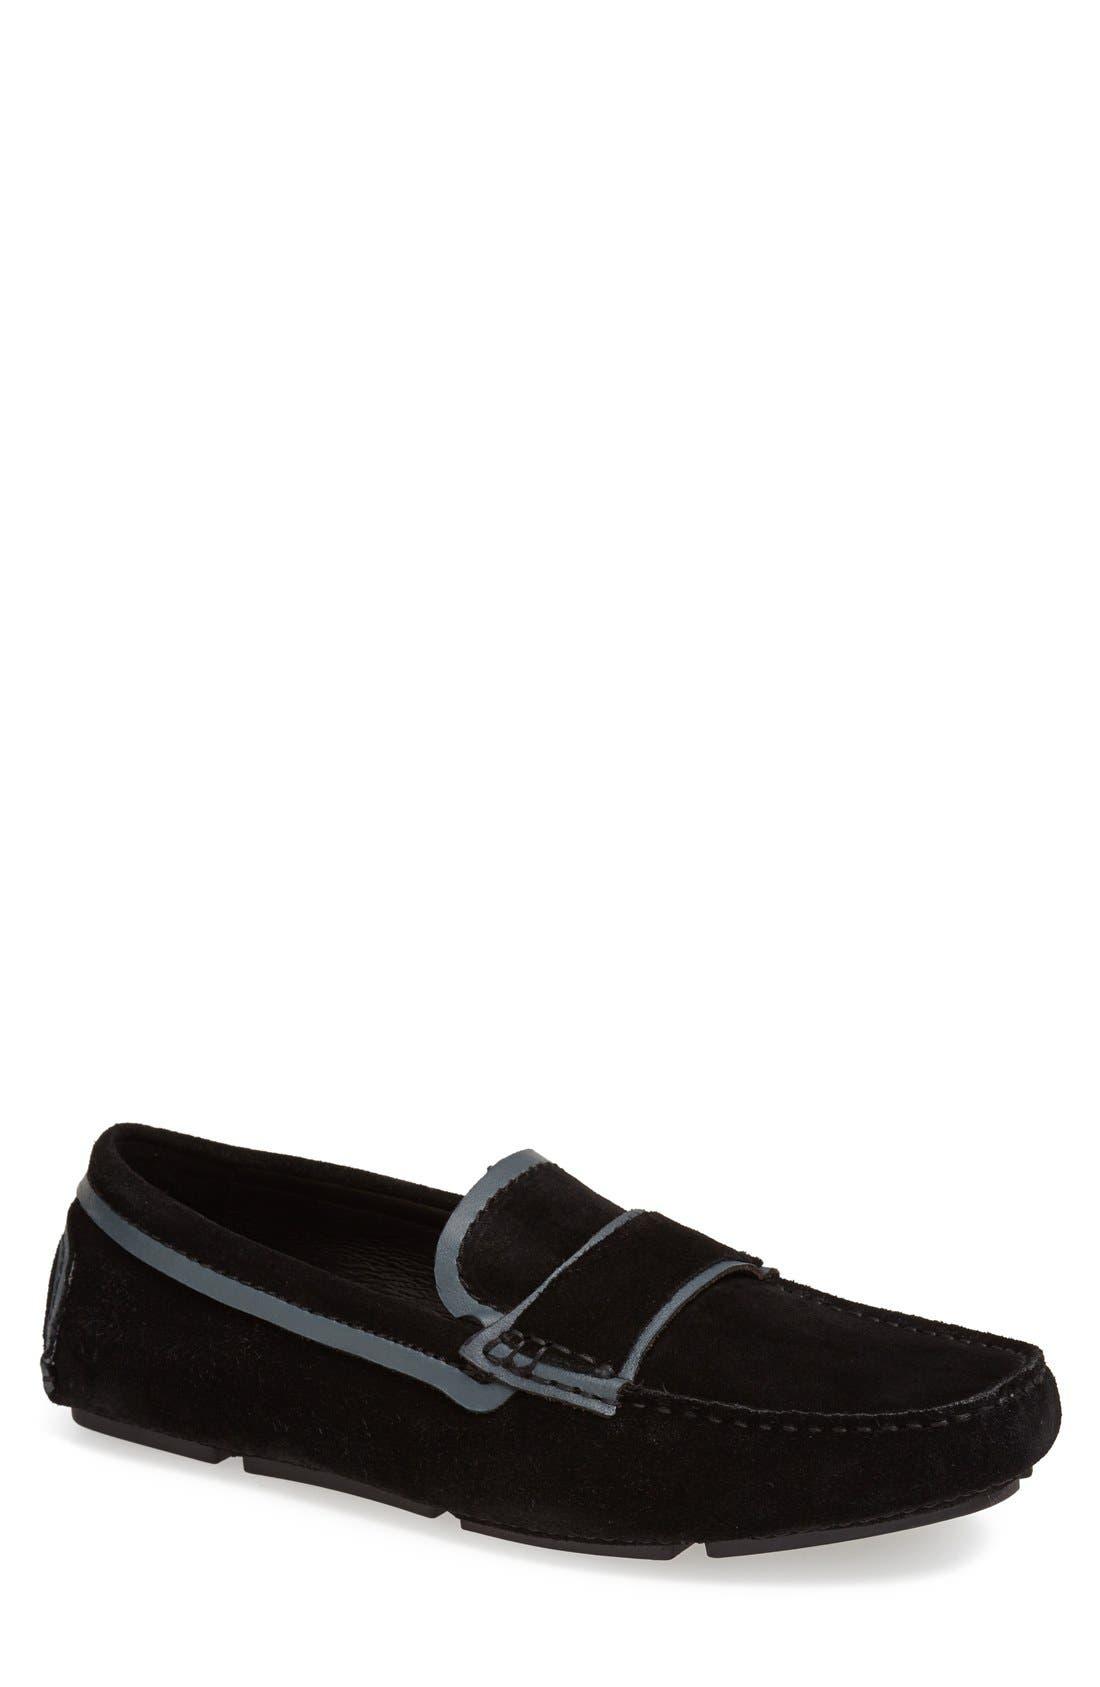 Alternate Image 1 Selected - Bugatchi 'Agam' Driving Shoe (Men)